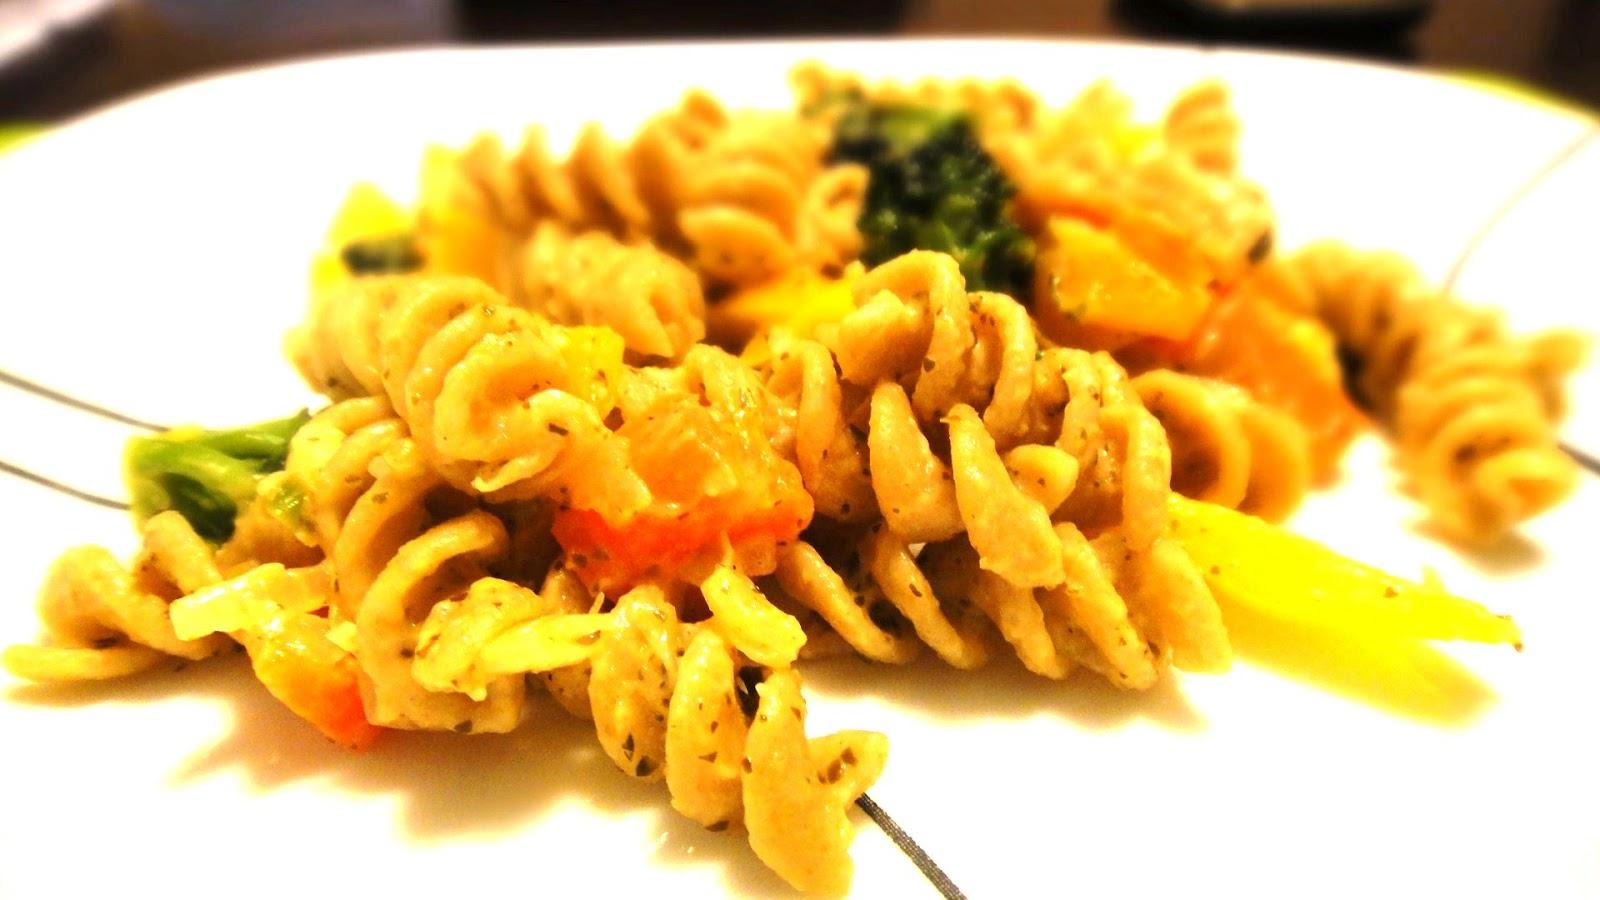 Kerala recipetamilnadu recipediet and healthnutrition how to make wheat pasta indian recipe a vegetarian break fast forumfinder Images